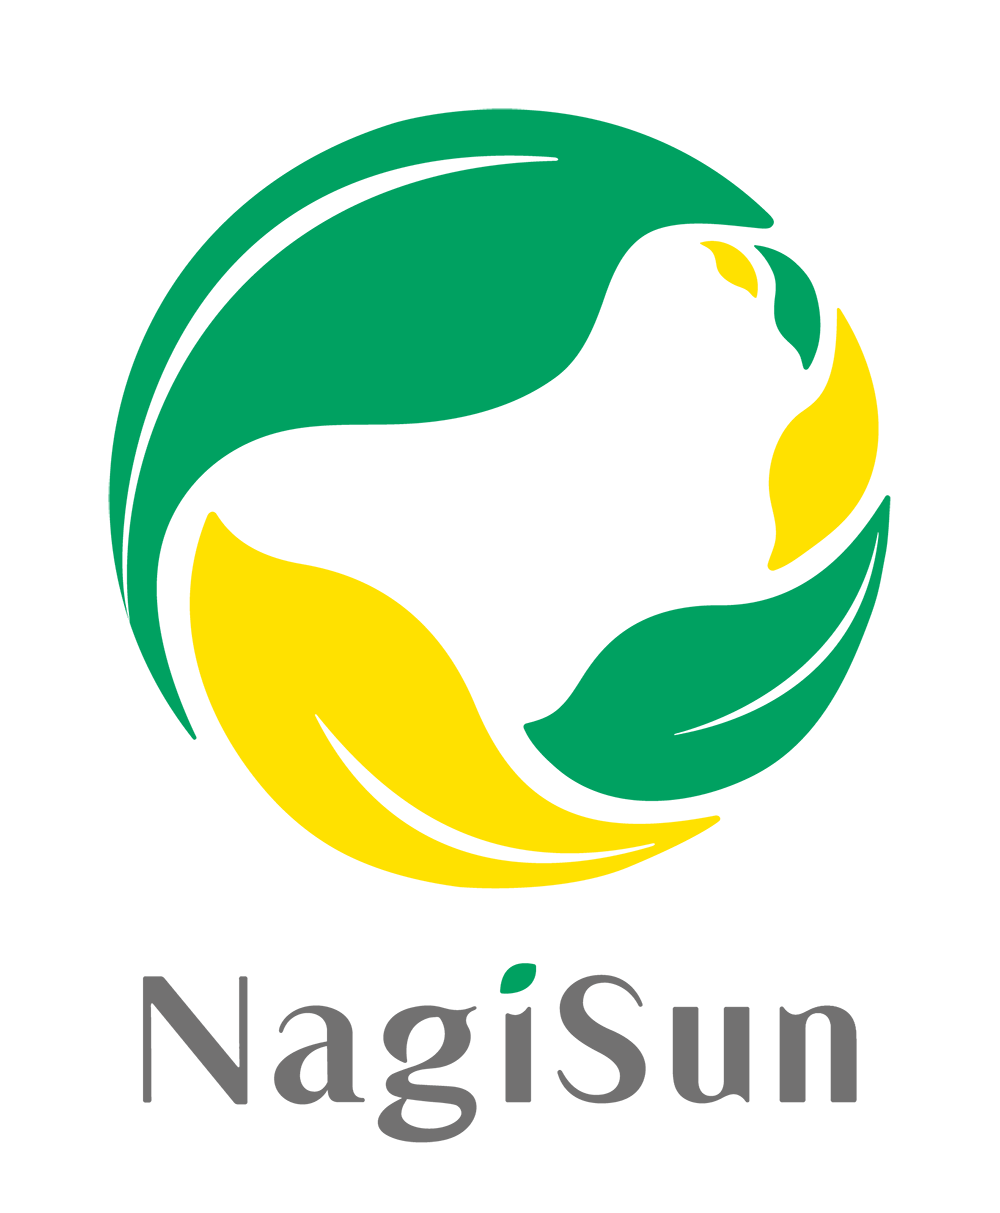 NagiSun